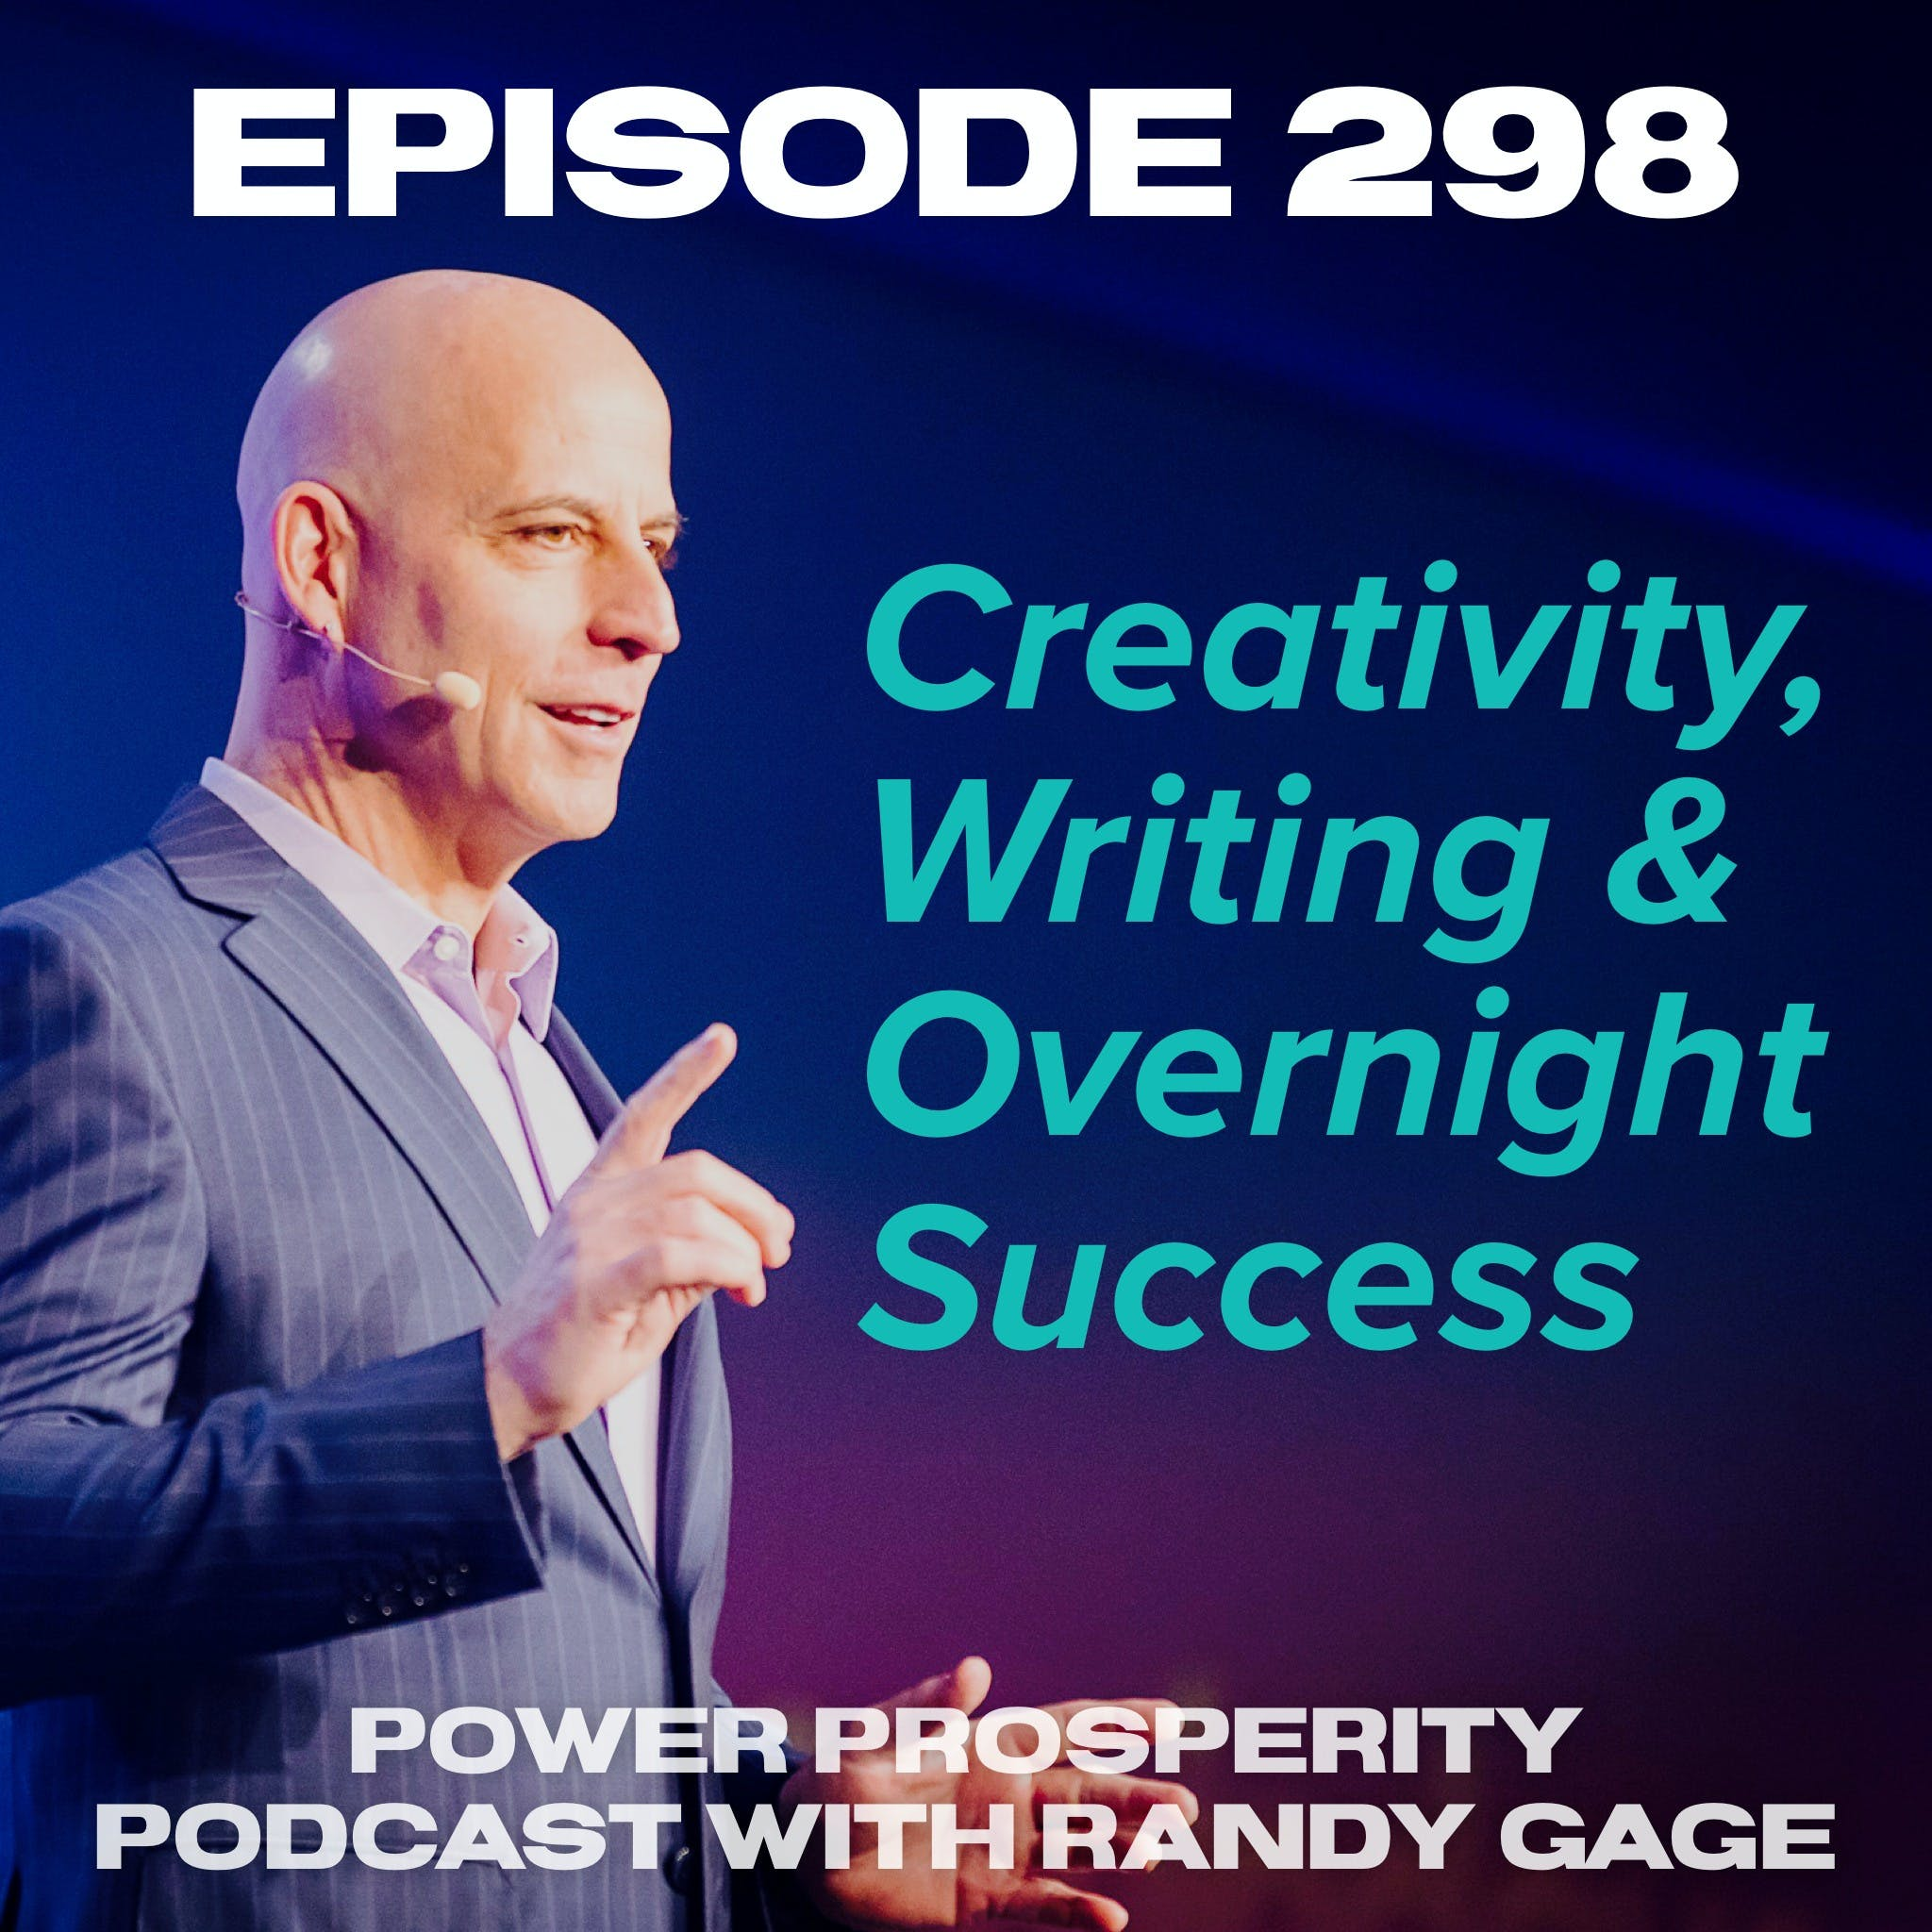 Episode 298: Steven Pressfield on Creativity, Writing & Overnight Success